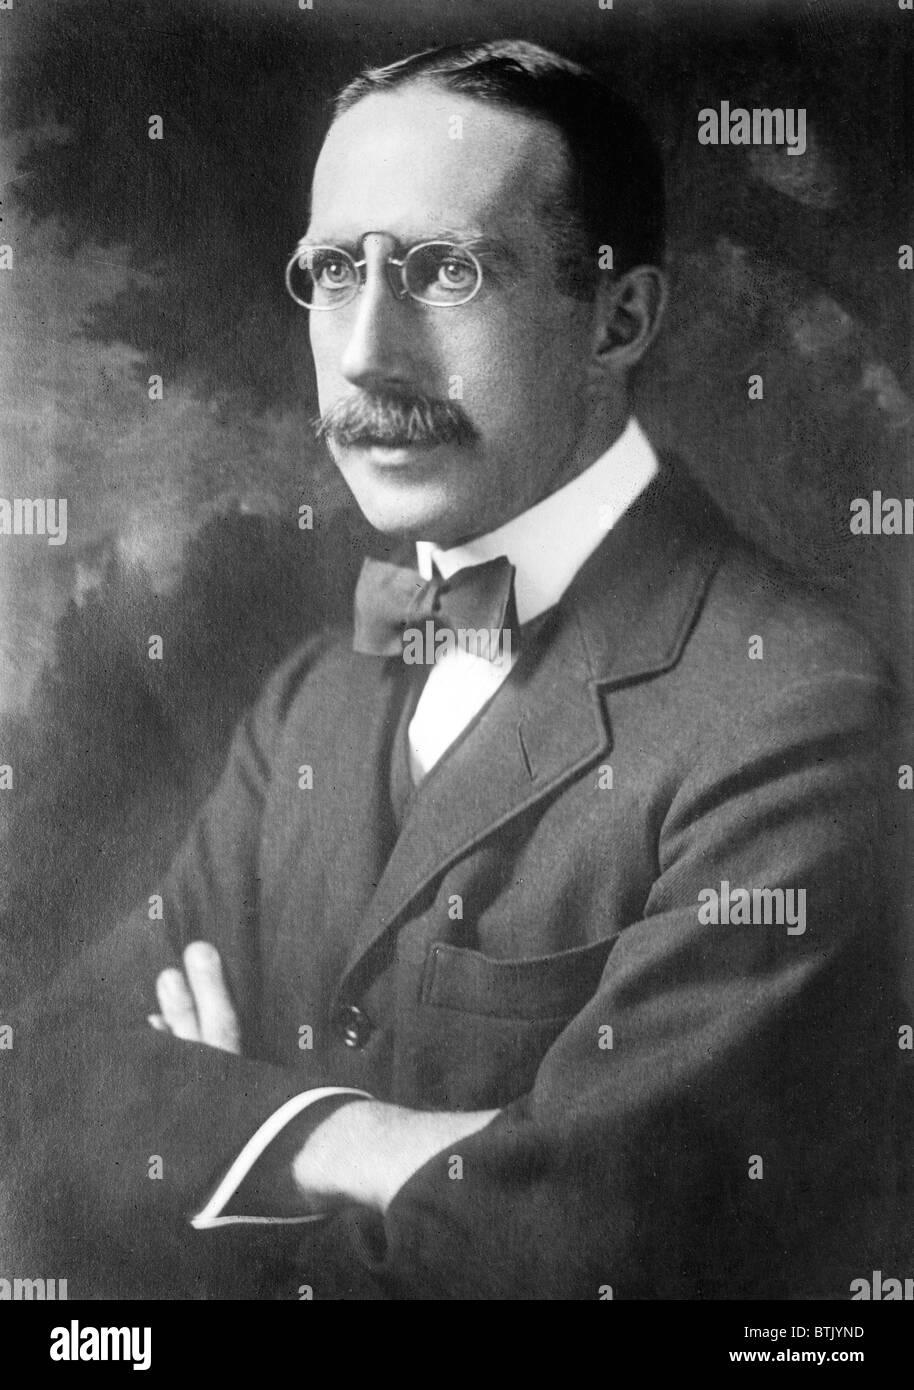 Theodore F. Green. Portrait, ca. 1912 Stock Photo - Alamy